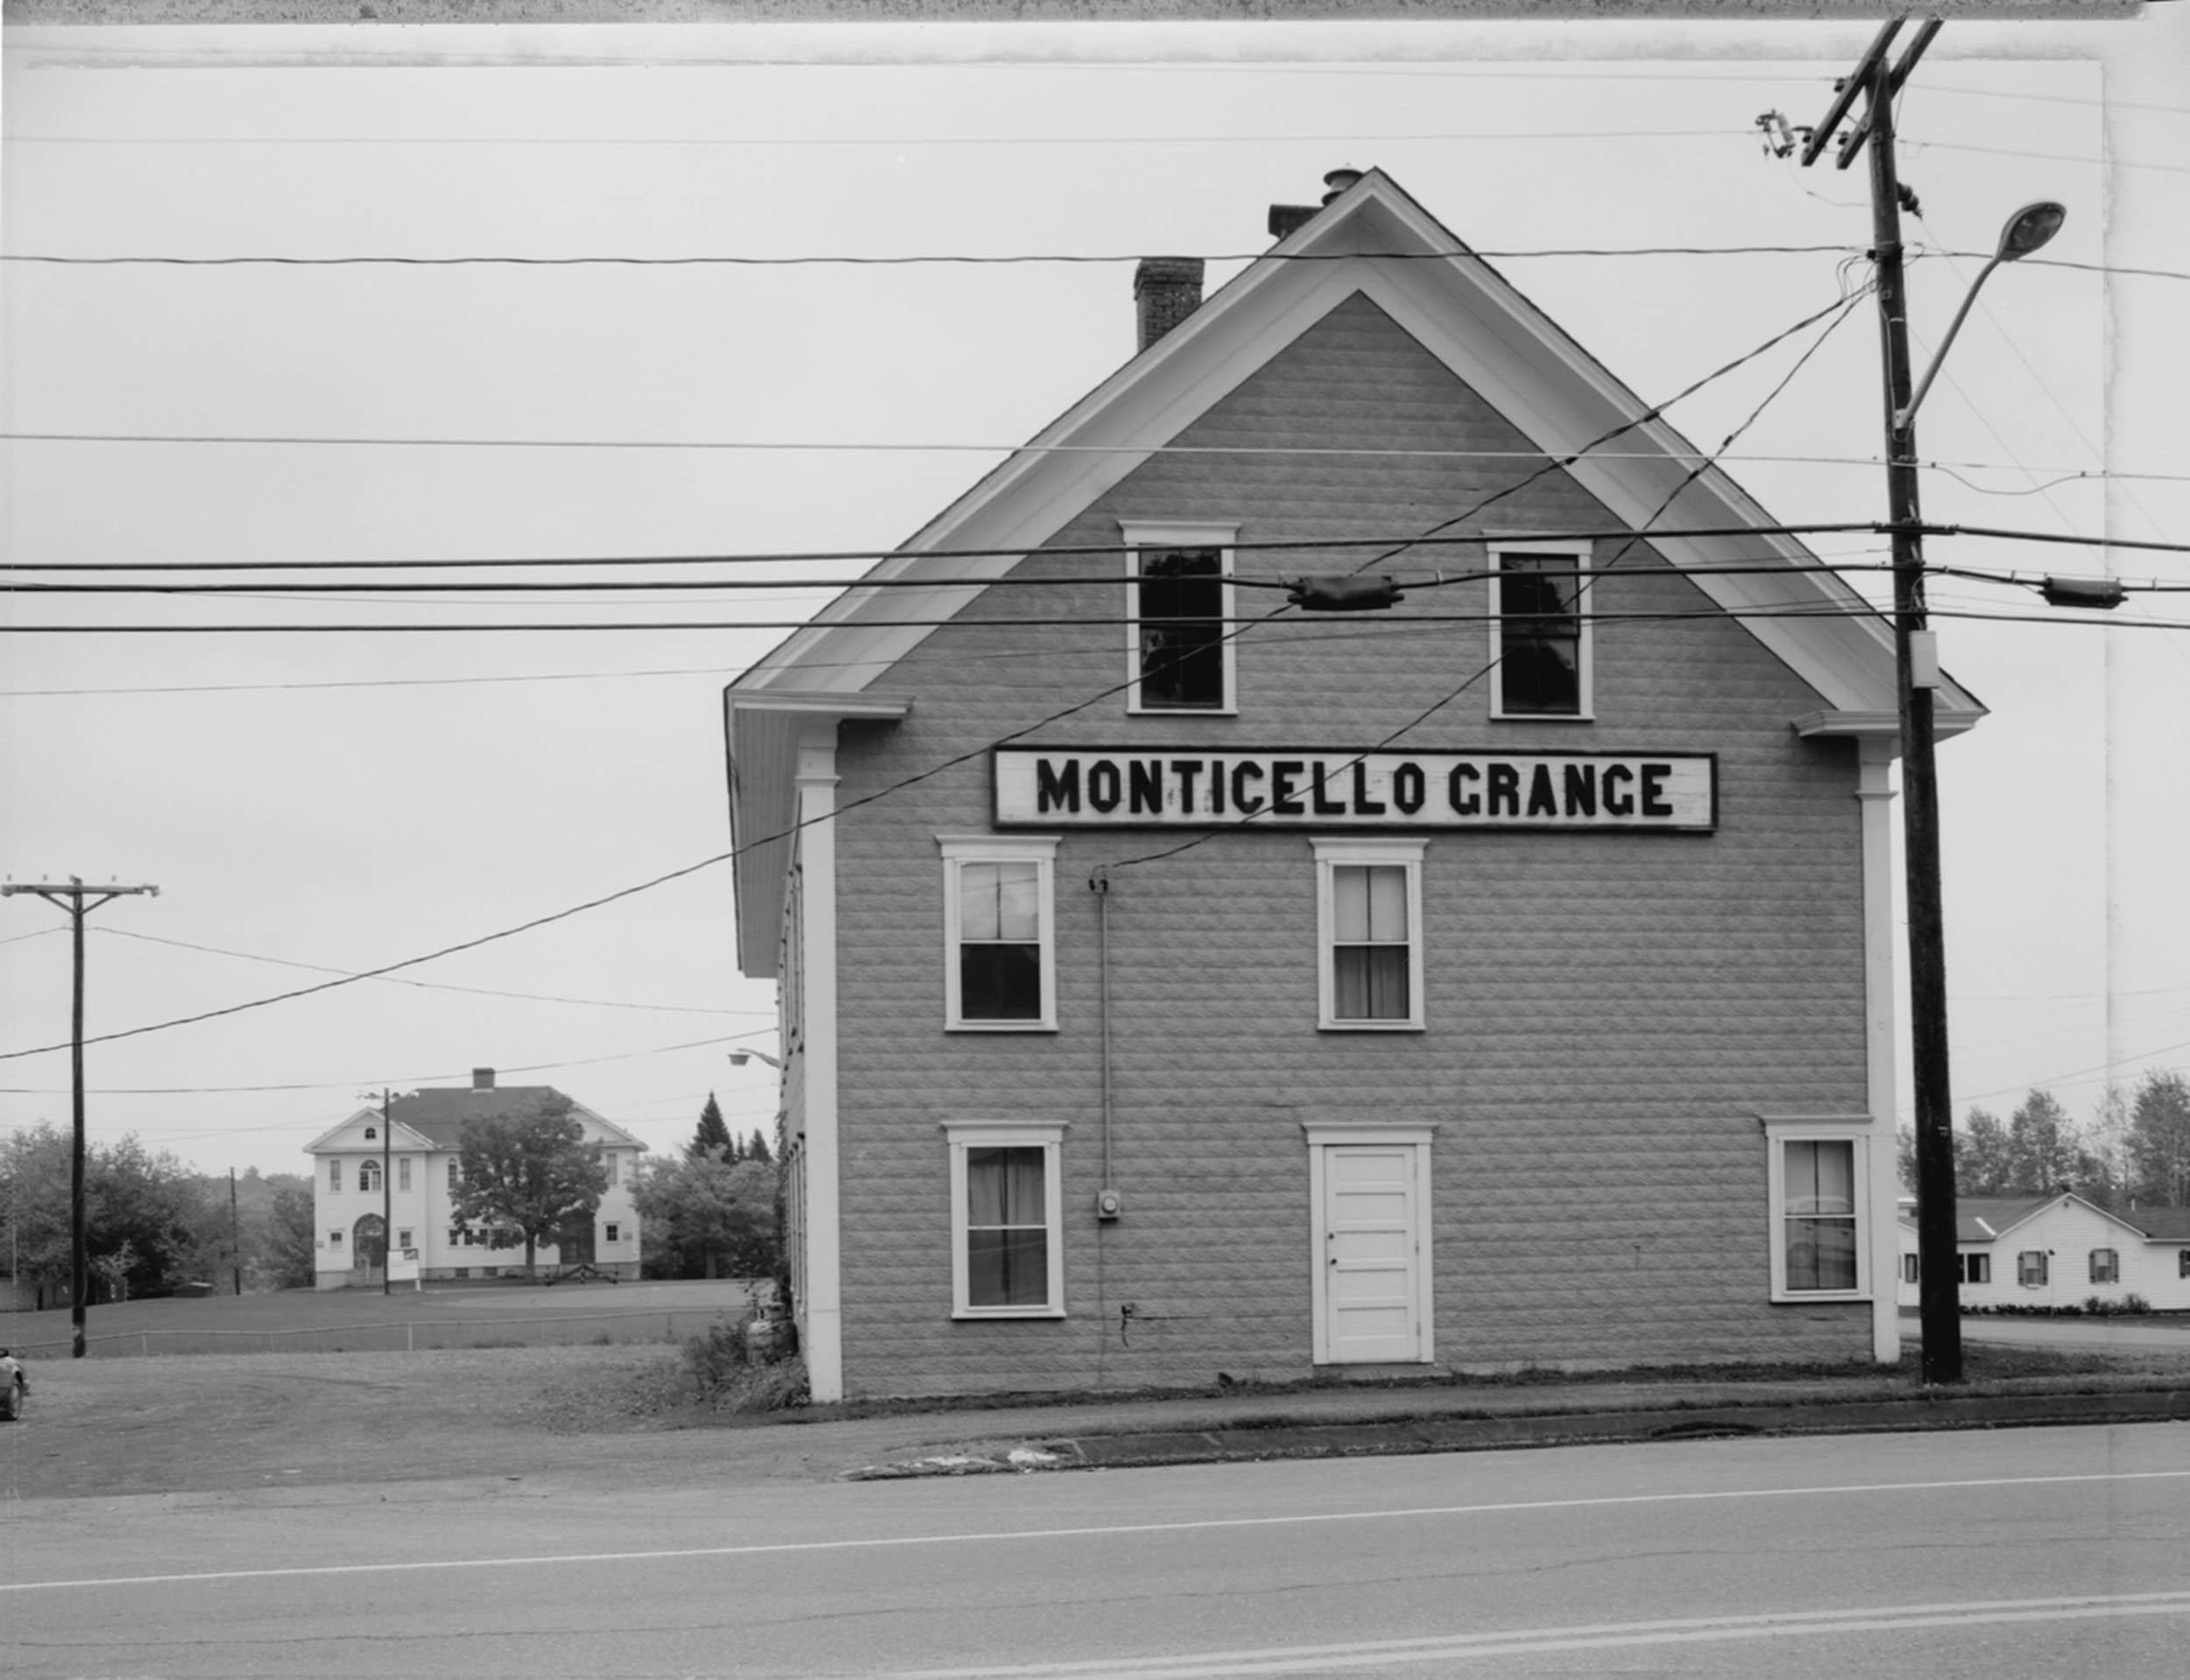 MonticelloGrange_cmyk-2.jpg